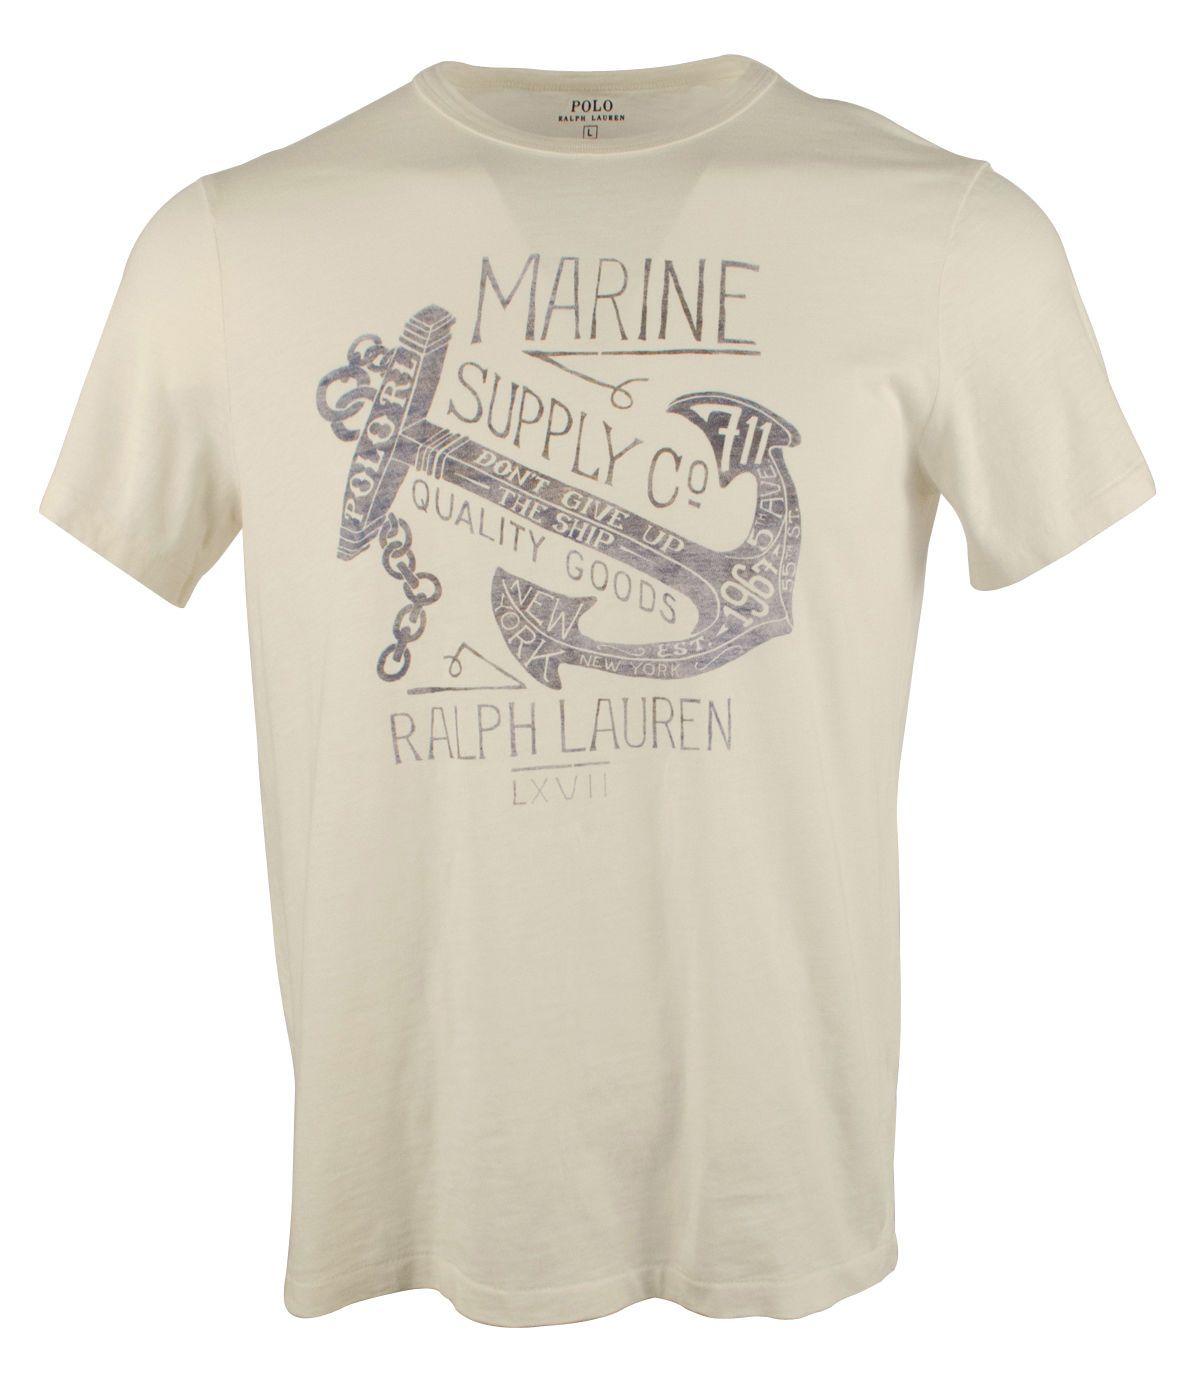 8ec19bc9b4635 ... norway t shirts 15687 polo ralph lauren men s custom fit anchor graphic  t shirt buy